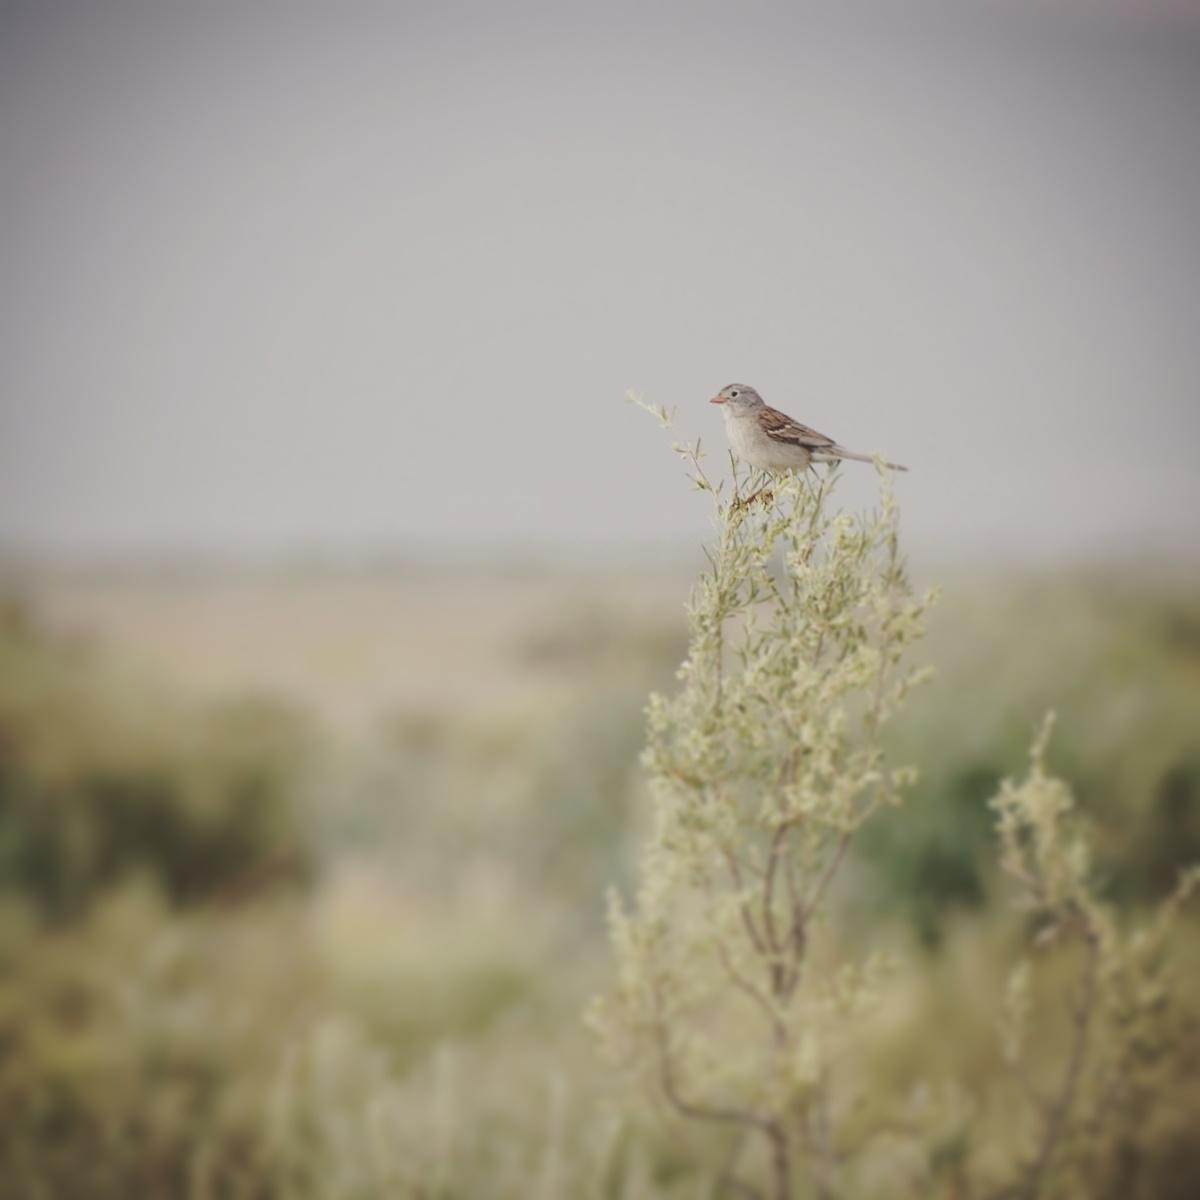 Noah's view of the Worthen's Sparrow. Noah Strycker